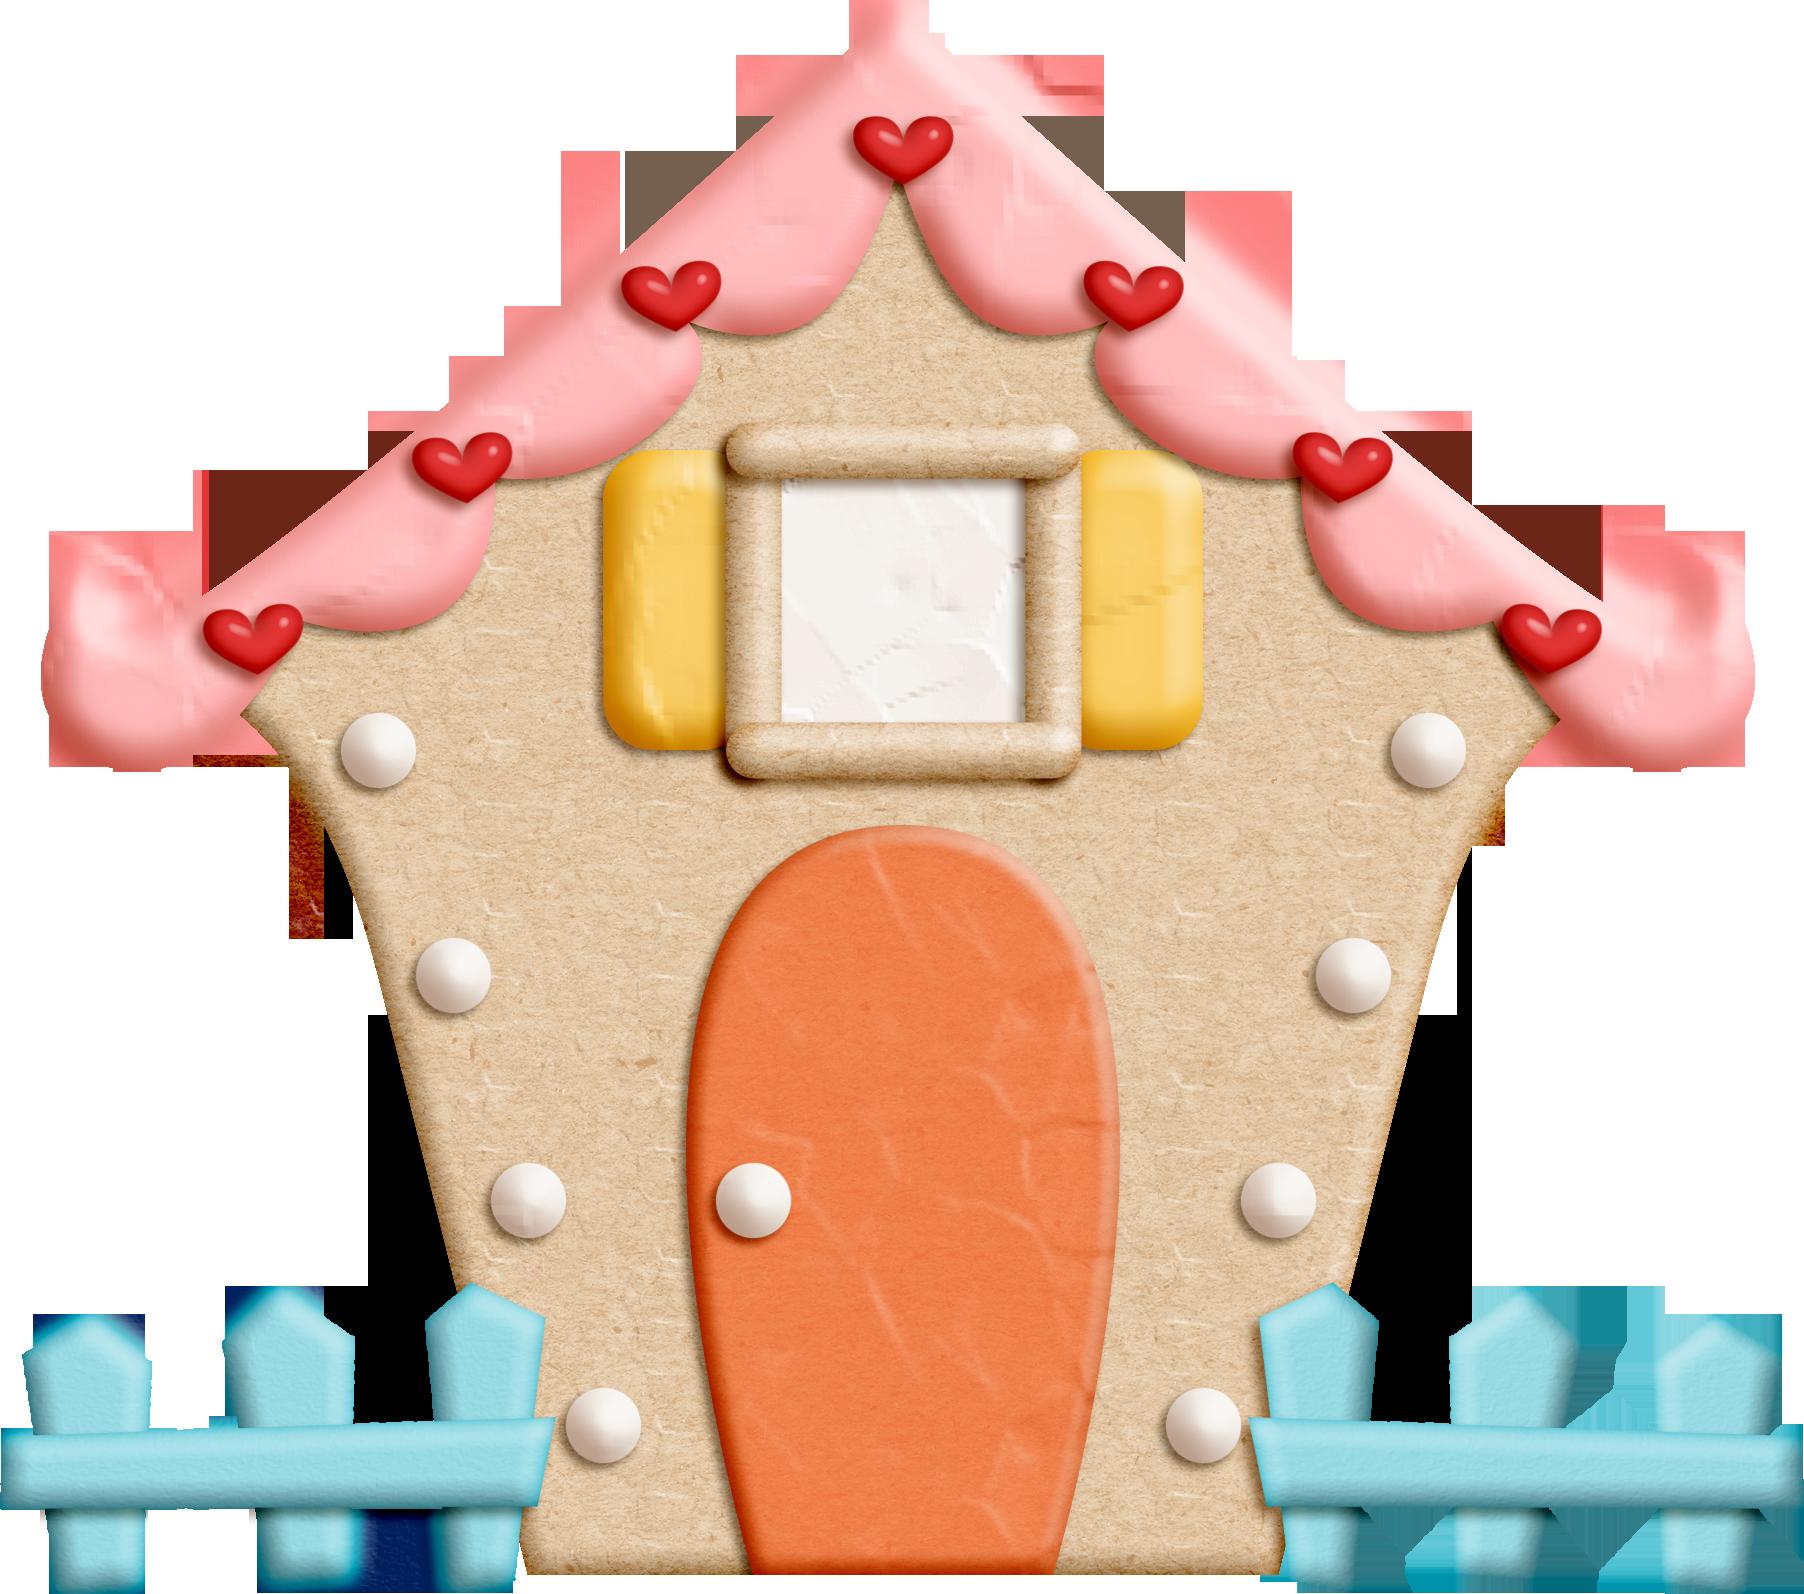 jdssewcuteandsweethouse.png (1804×1594) | hongos | Pinterest | House ... royalty free